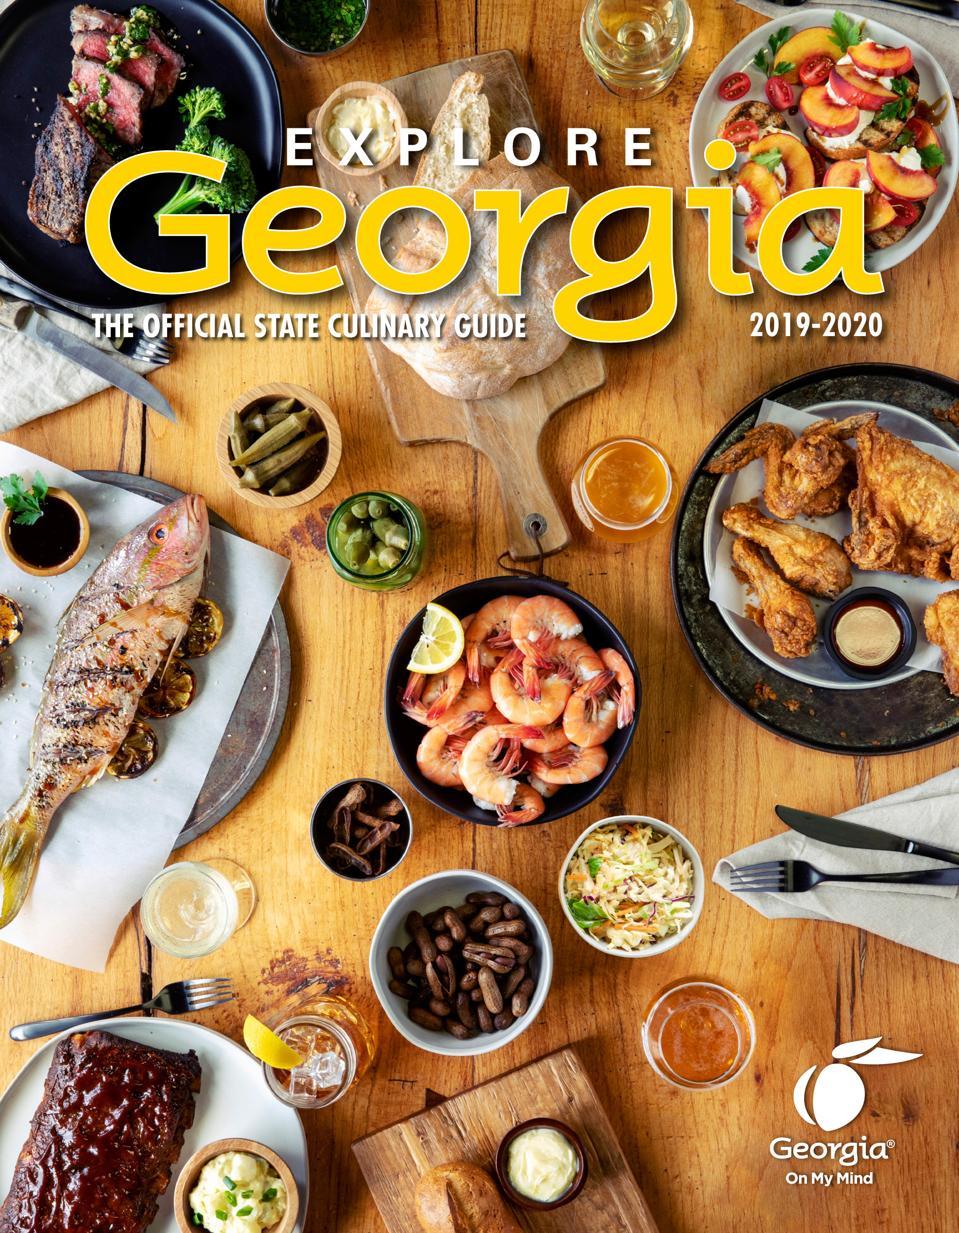 Explore Georgia Culinary Guide